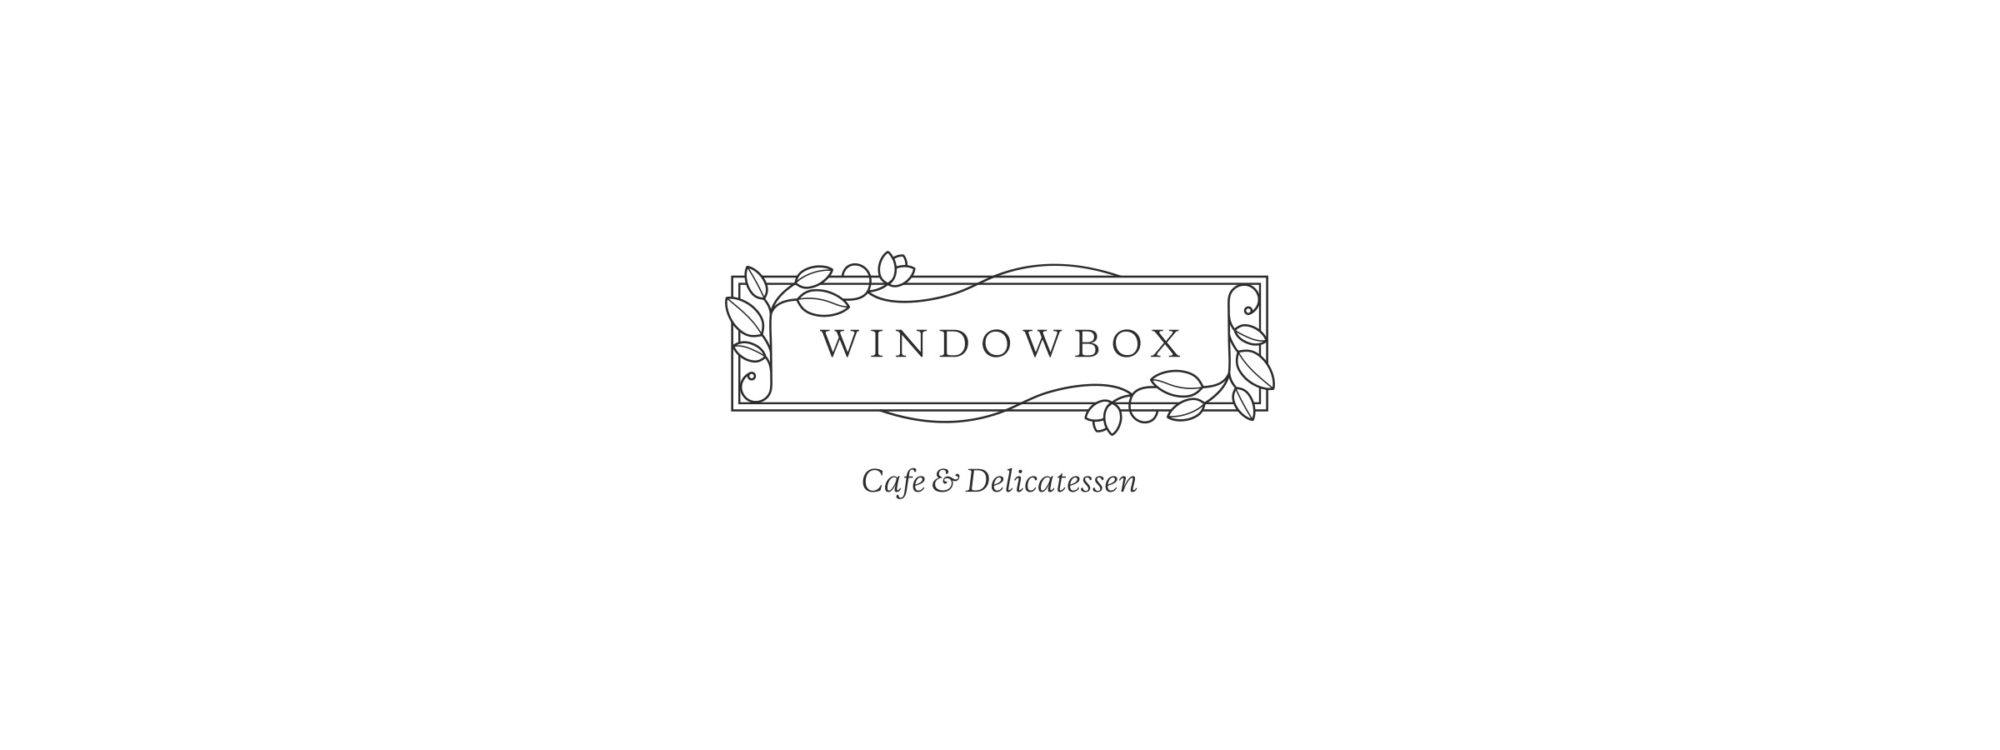 Fuse Design Ltd - Fuse-Design_Logo-Design-Nottingham-Windowbox